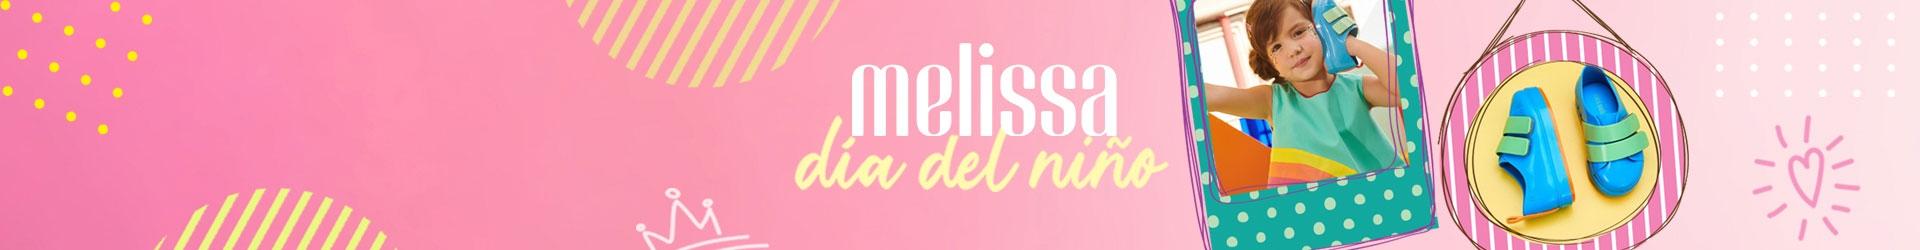 Melissa Balerinas